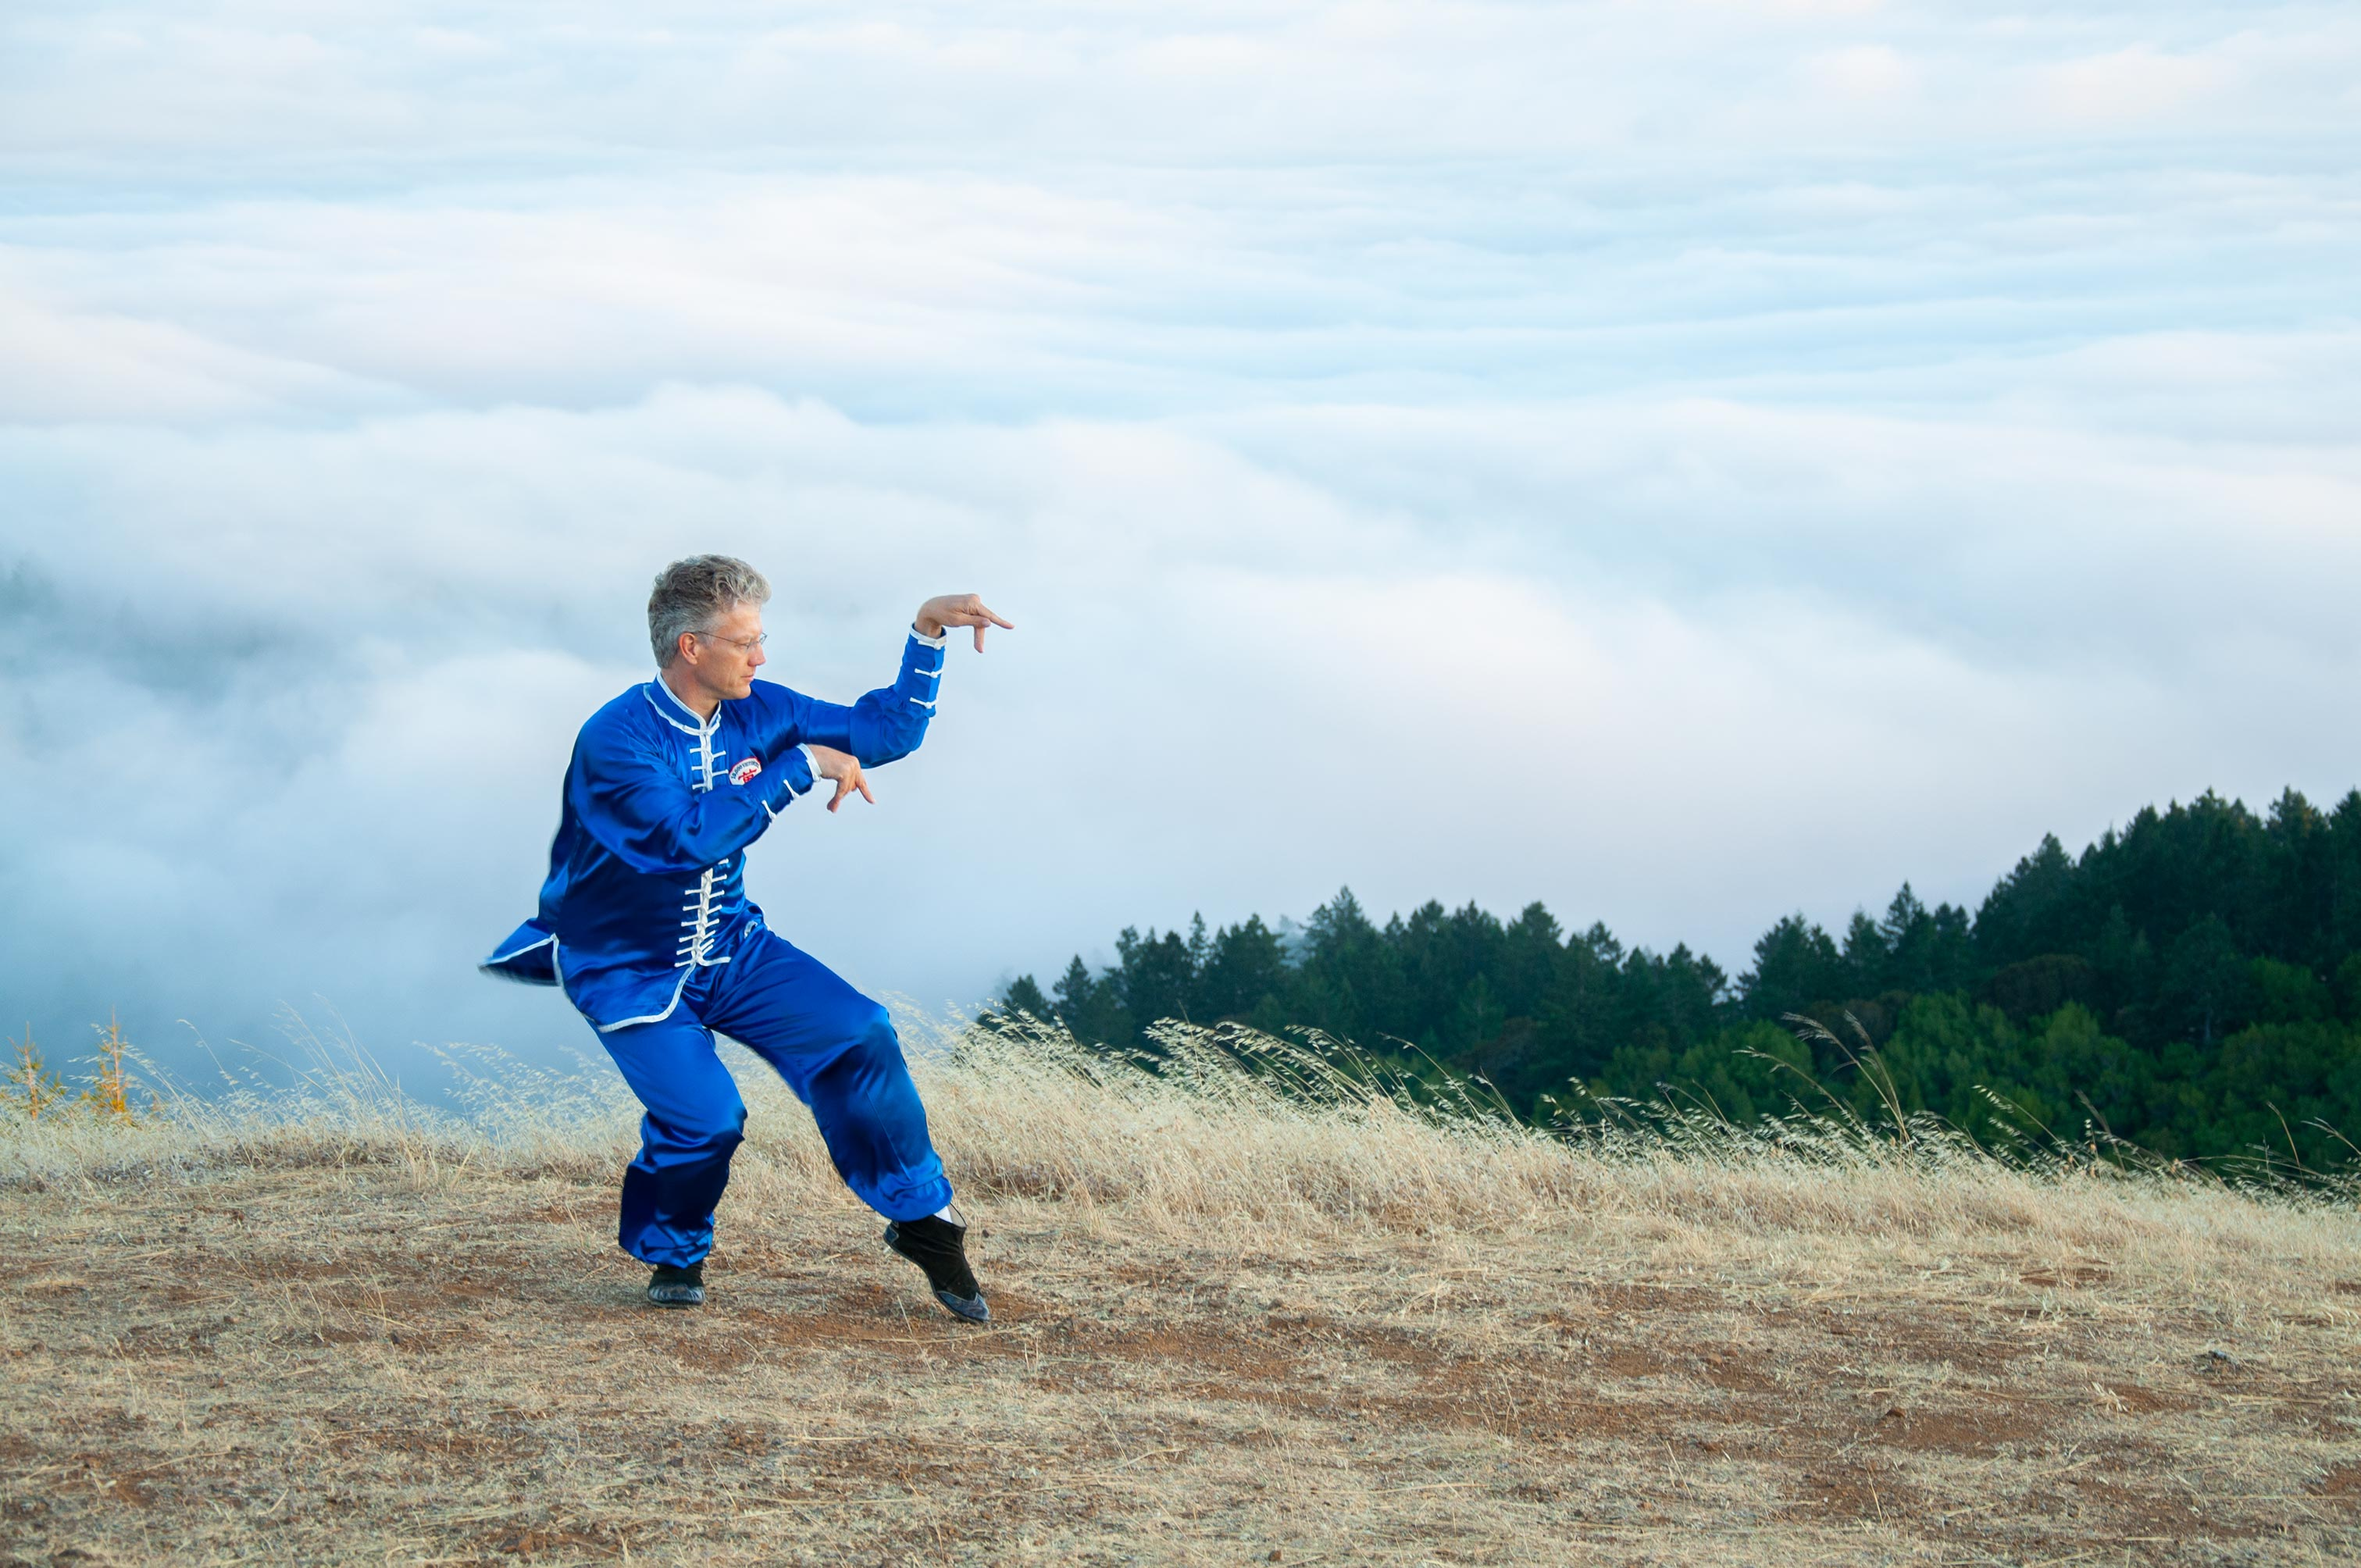 Sifu Jensen performs praying mantis stance on Mt. Tam. 10,000 Victories school is located in San Rafael, Marin, CA.